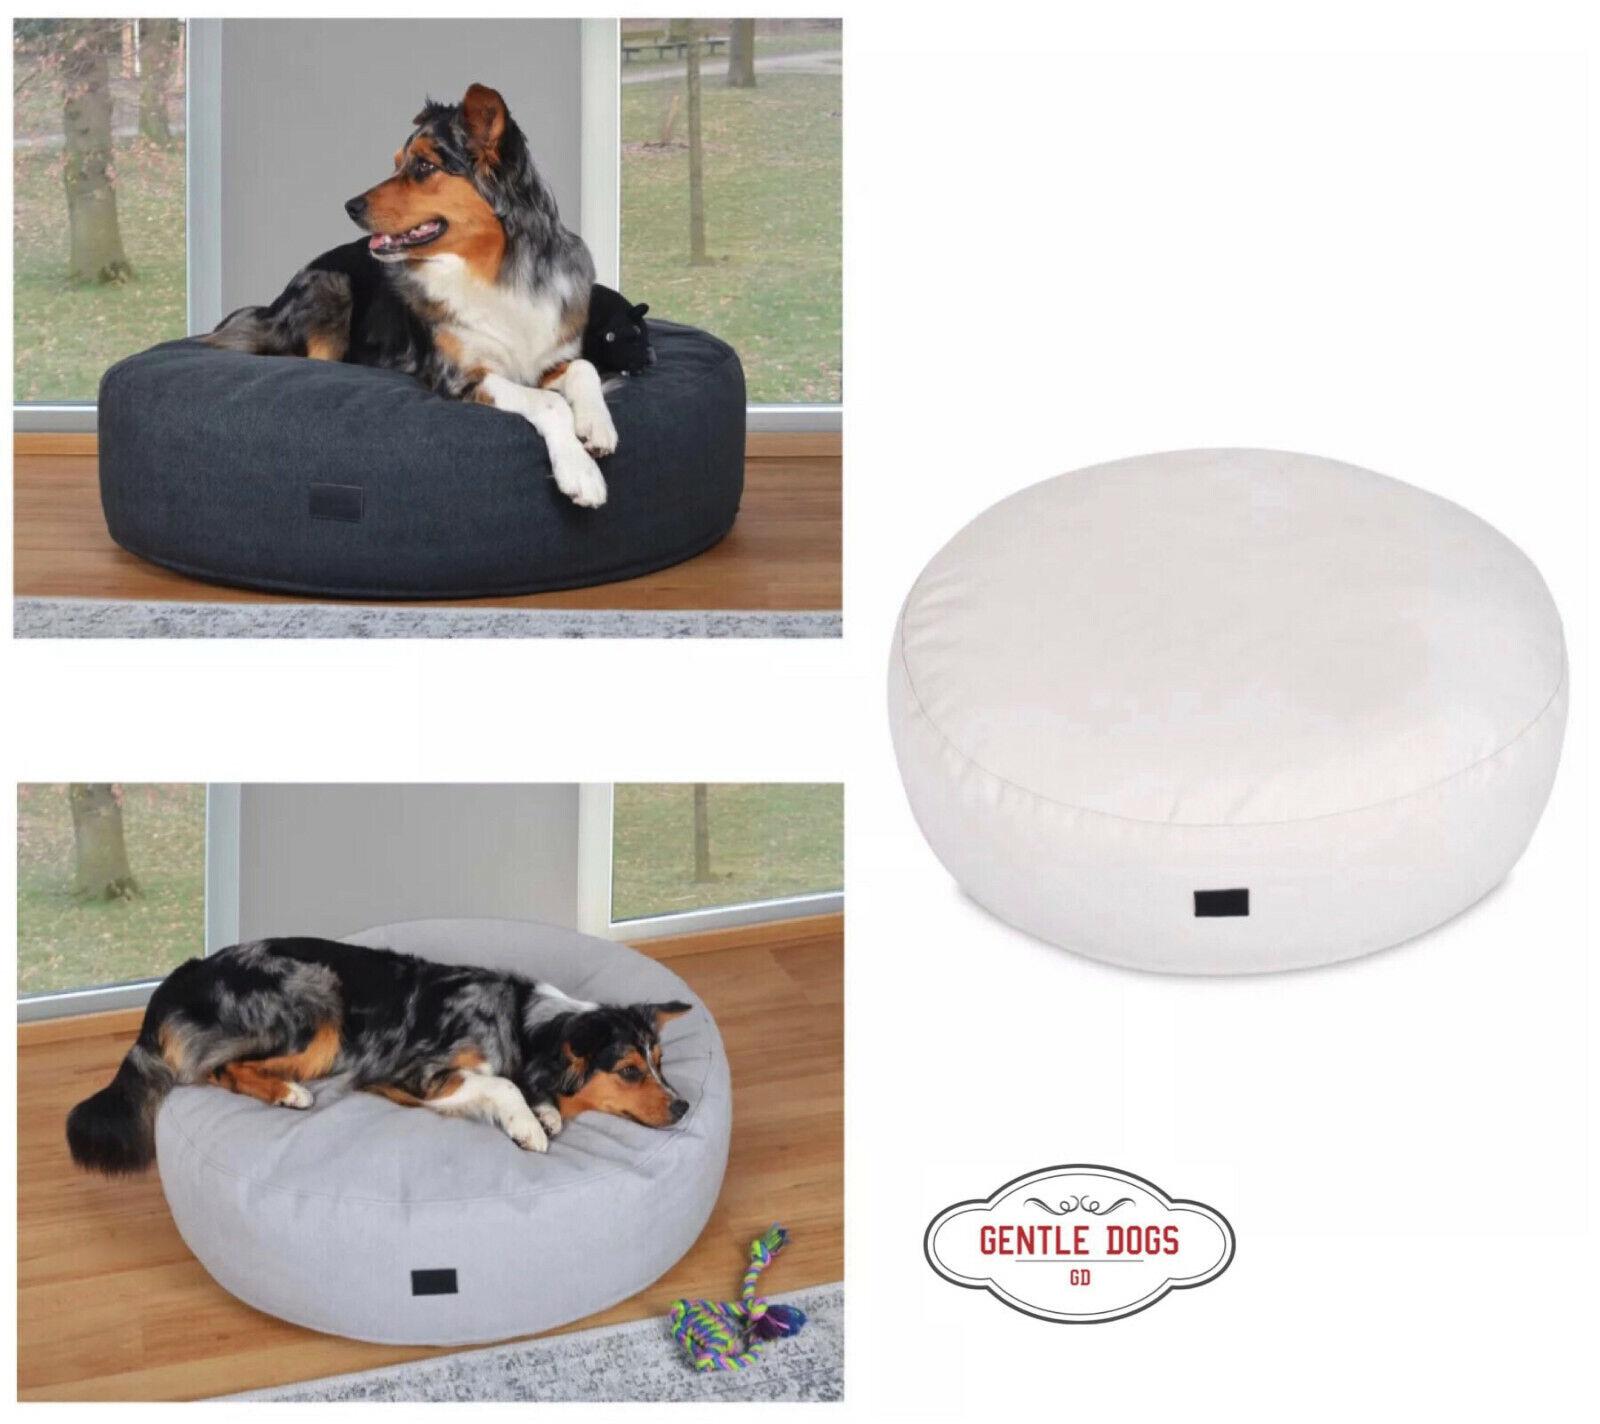 Hundekissen,Hundebett, Modell Mio Select+ Luxuryline von Padsforall gratis Vs.